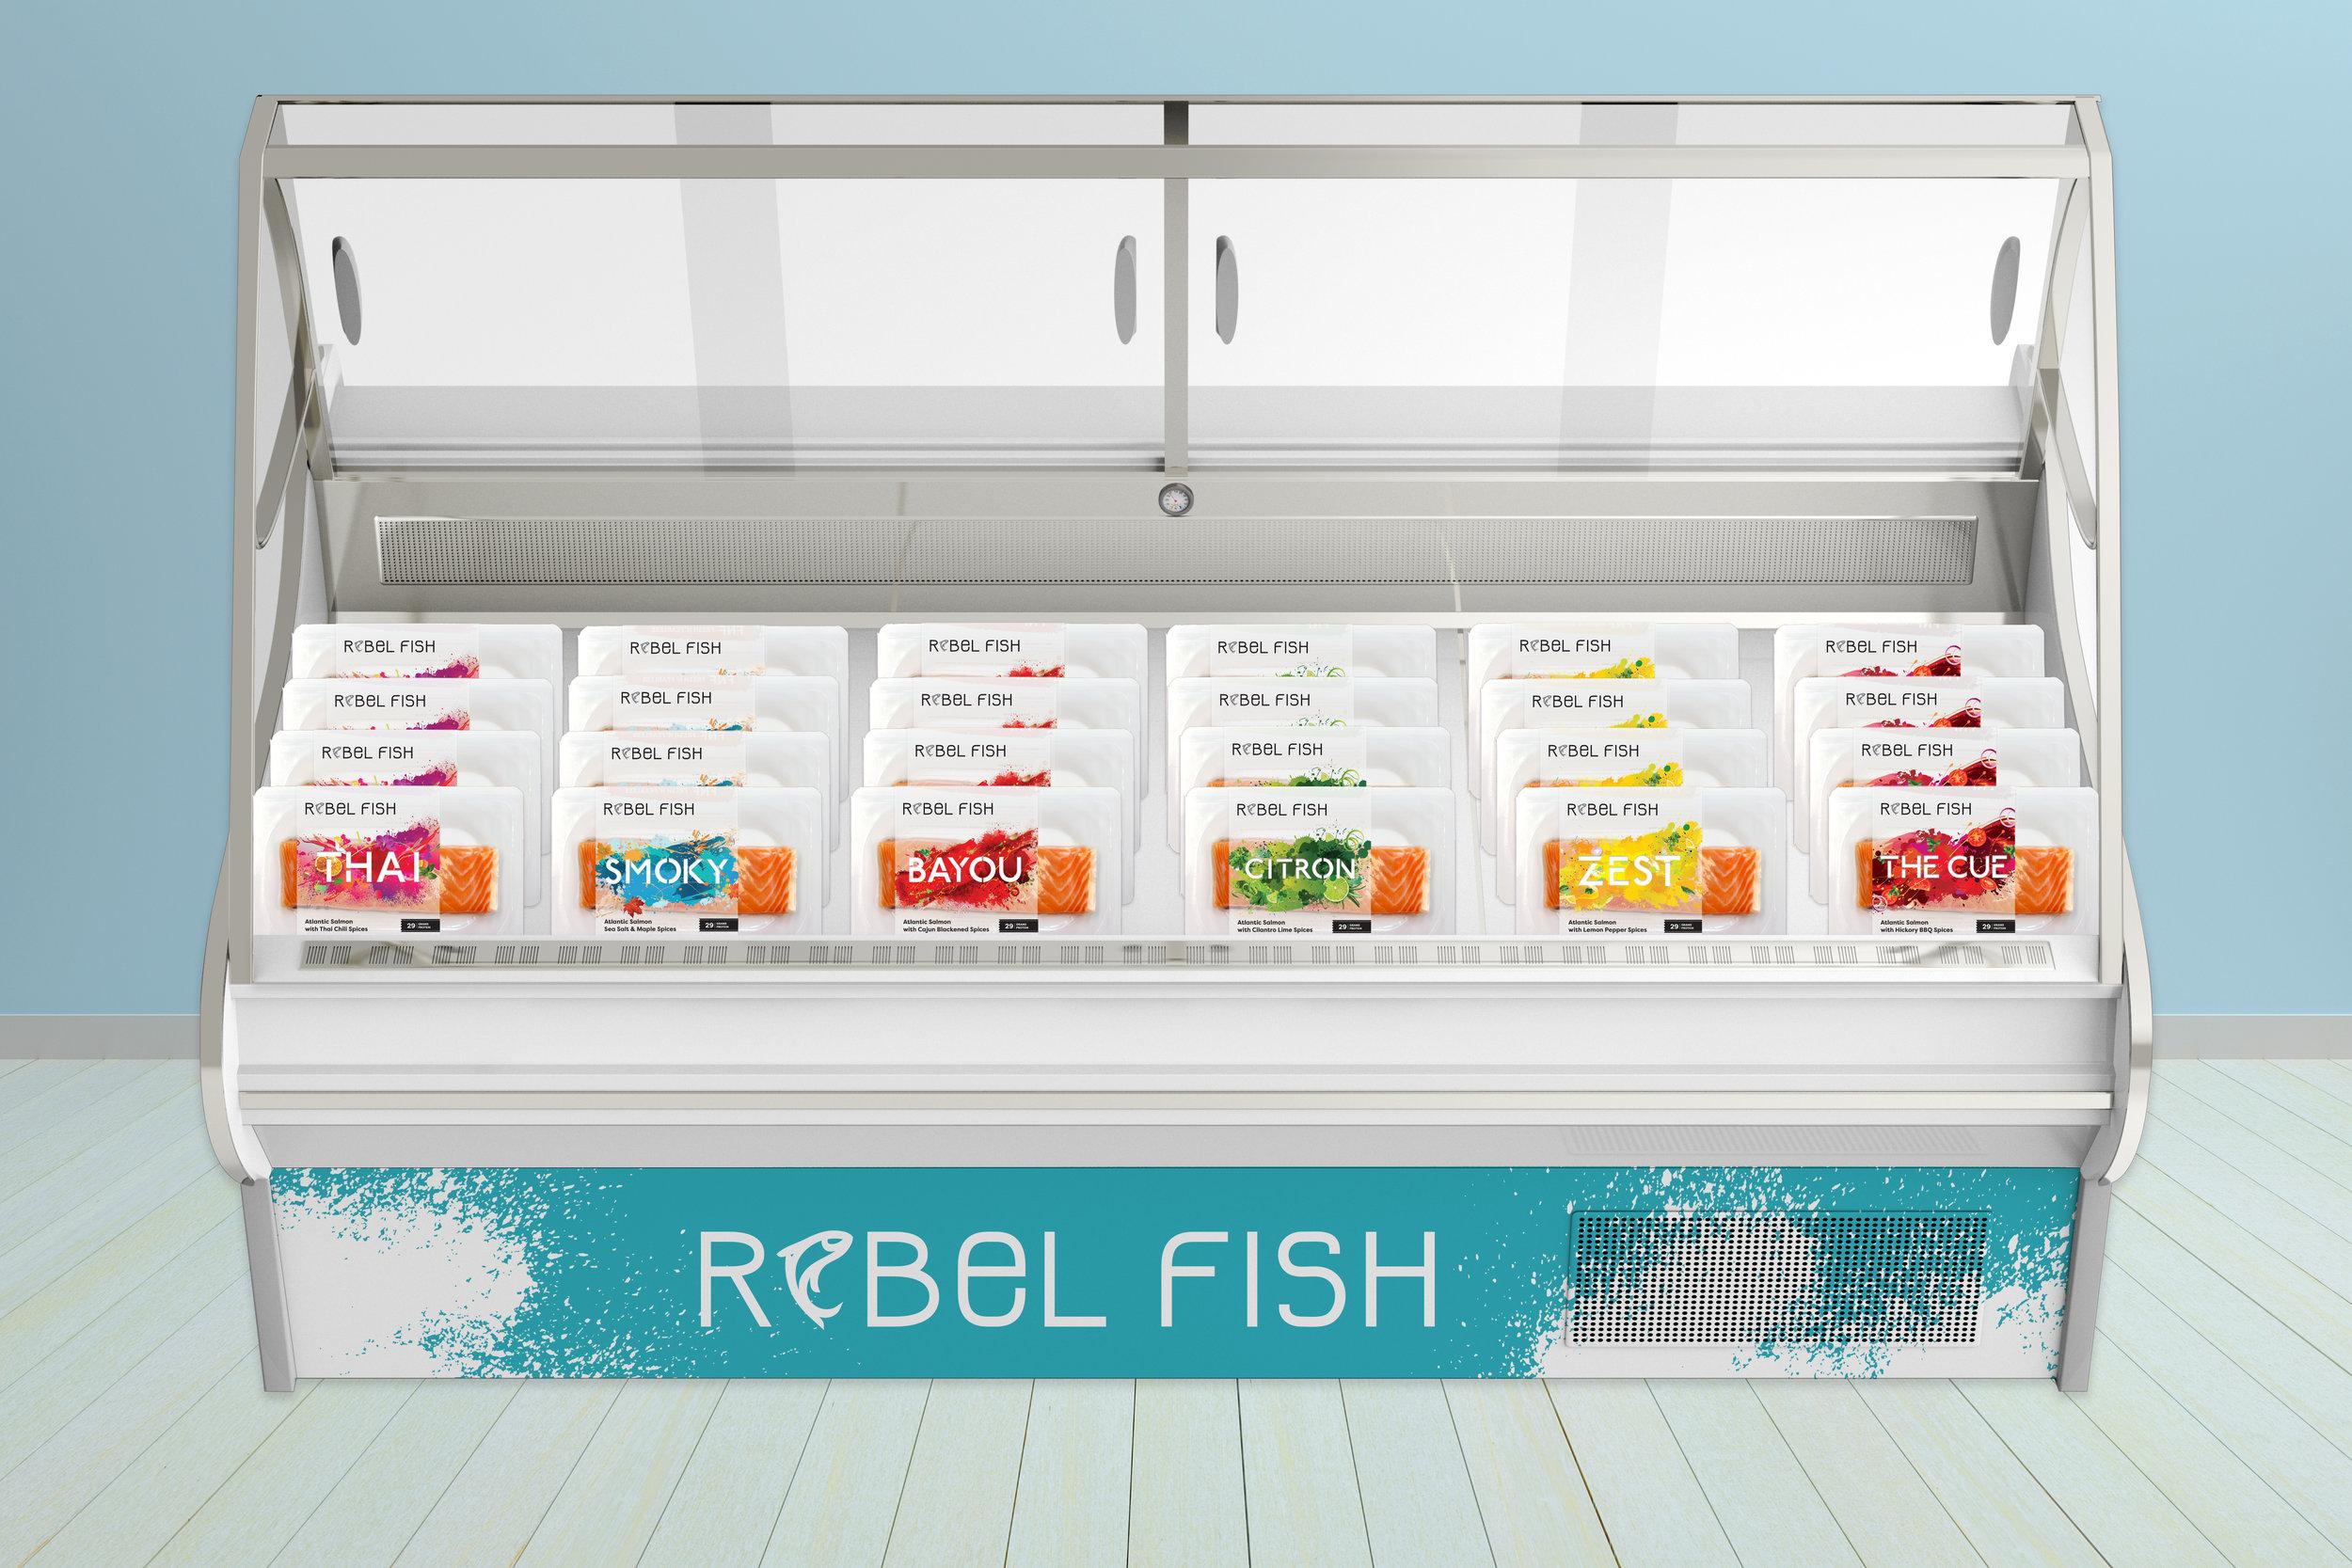 Rebel Fish Fridge.jpg